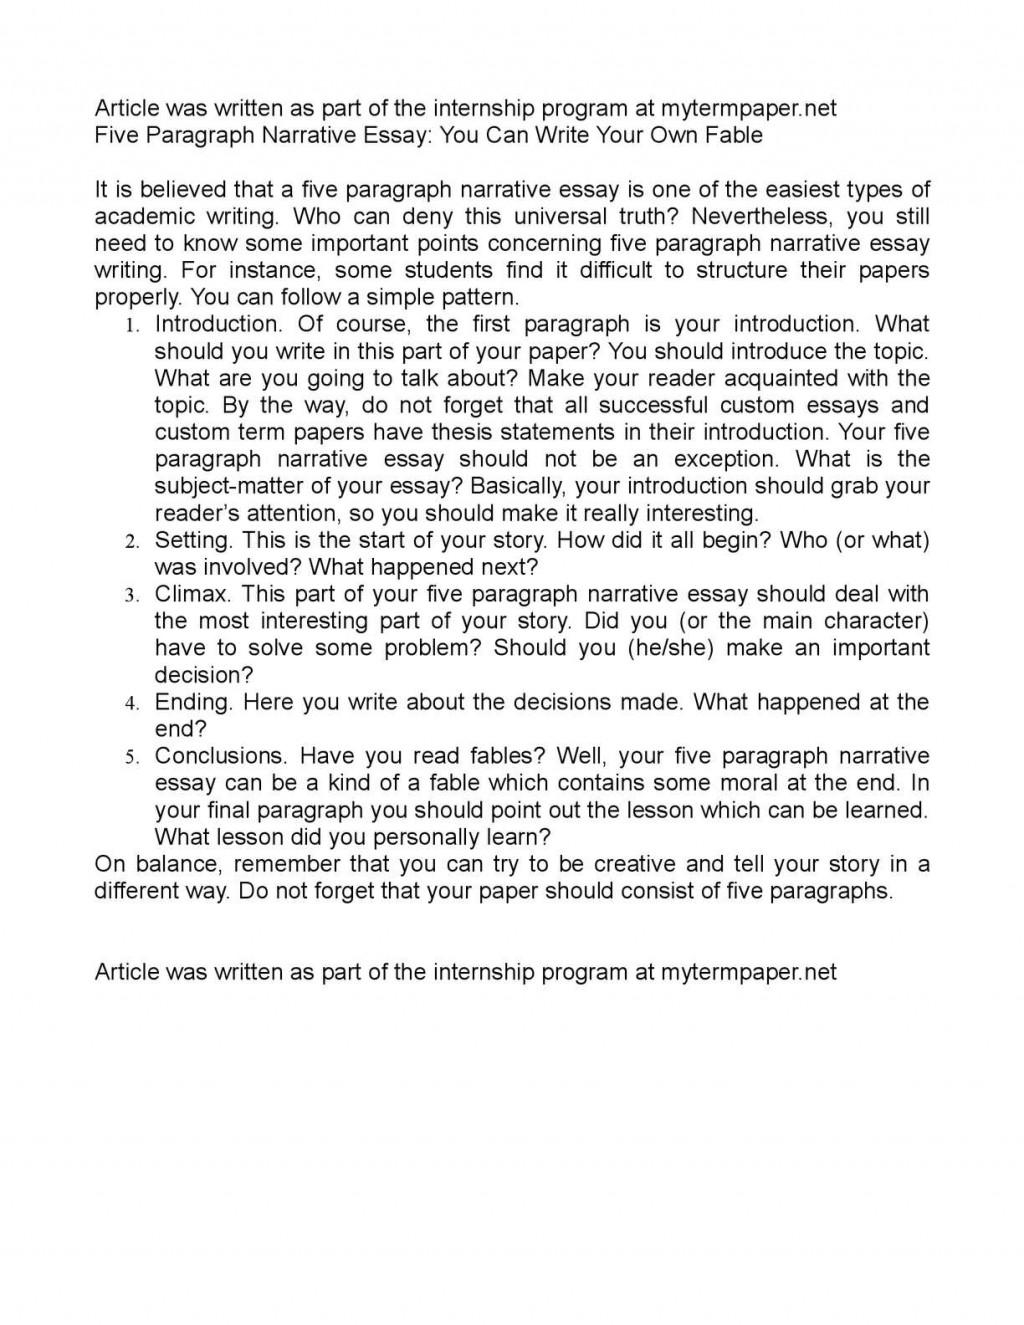 002 Paragraph Essay Example College Do Essays Have To Paragraphs Calam Eacute O Five Paragra Excellent 5 Pdf Large